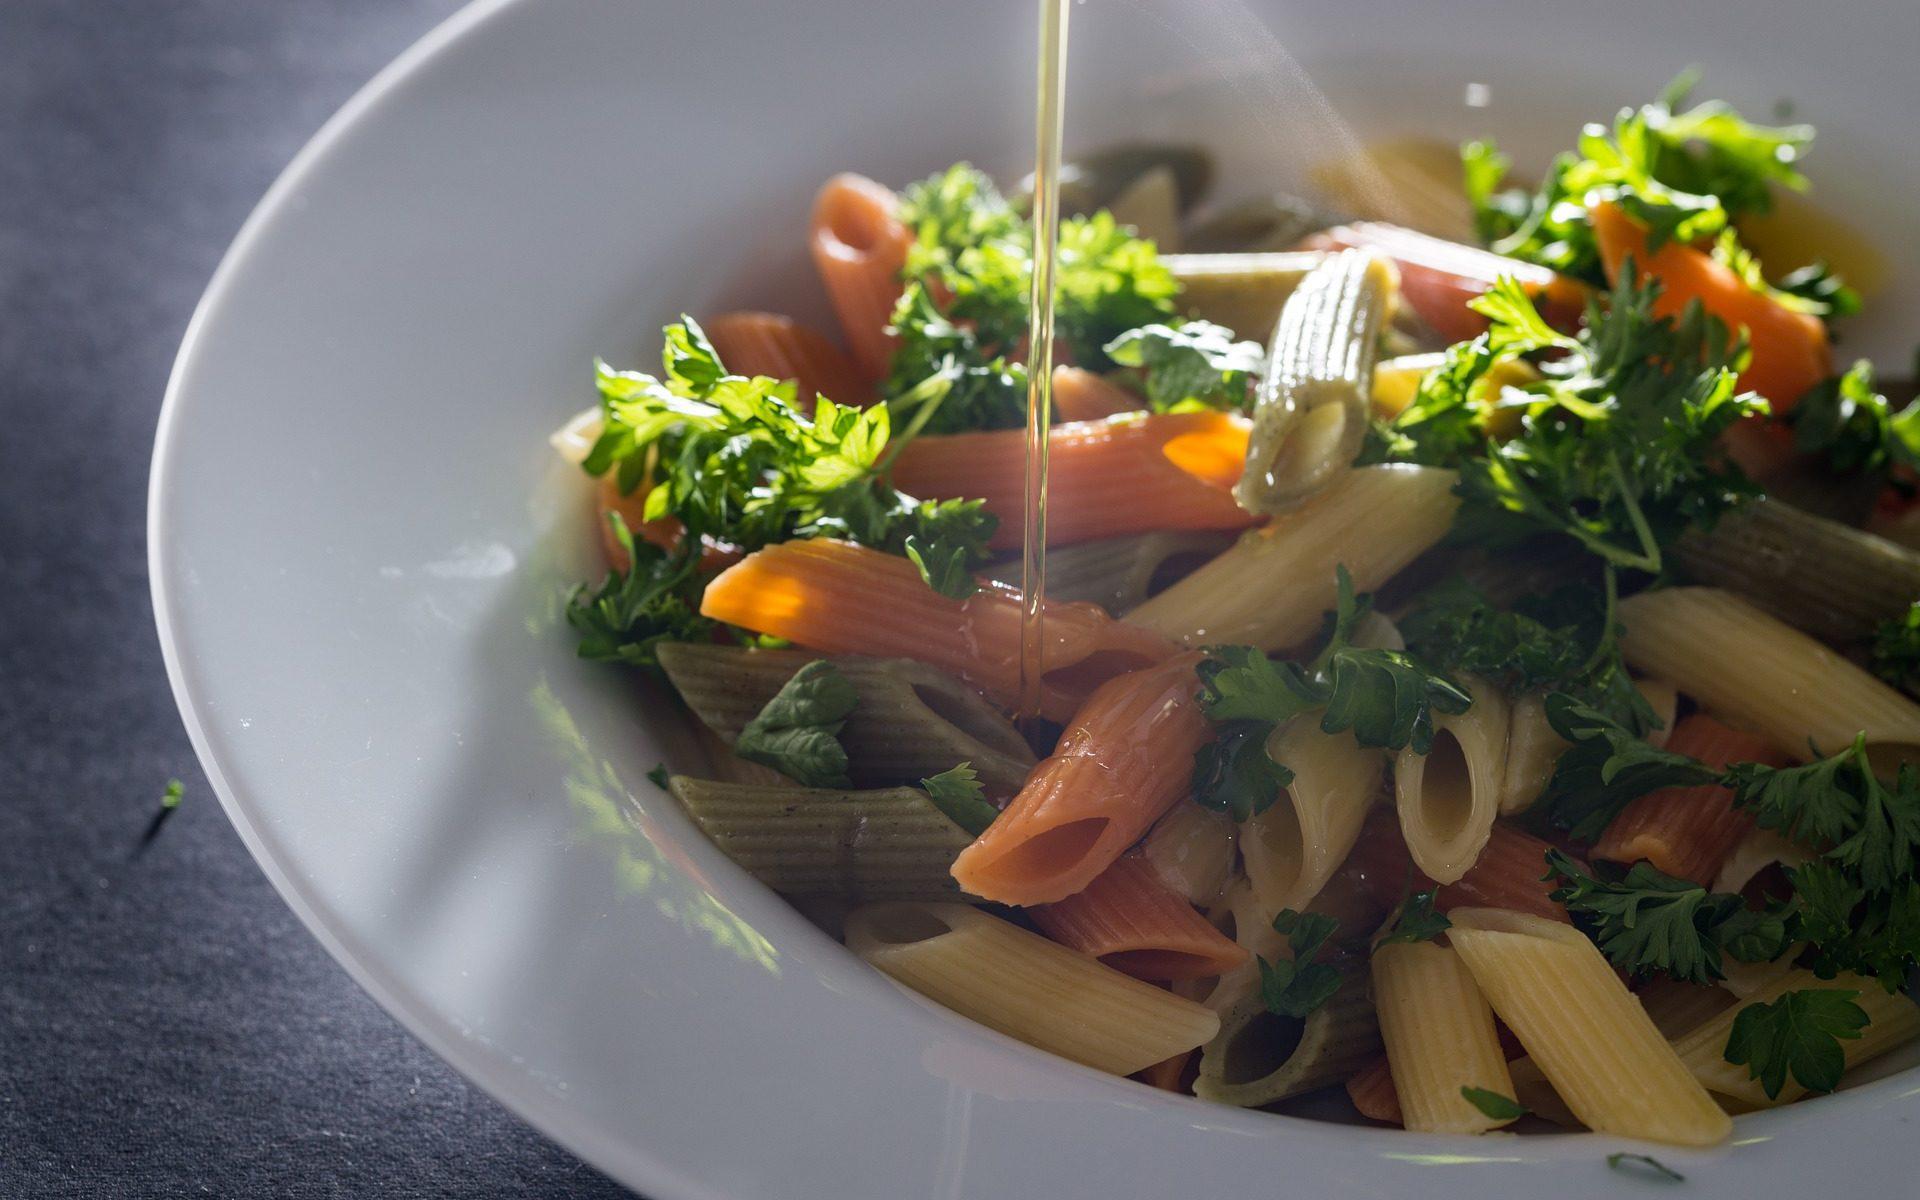 pasta parsley pesto olive oil 1920x1200 - Eat USA: Italian Food in Boston